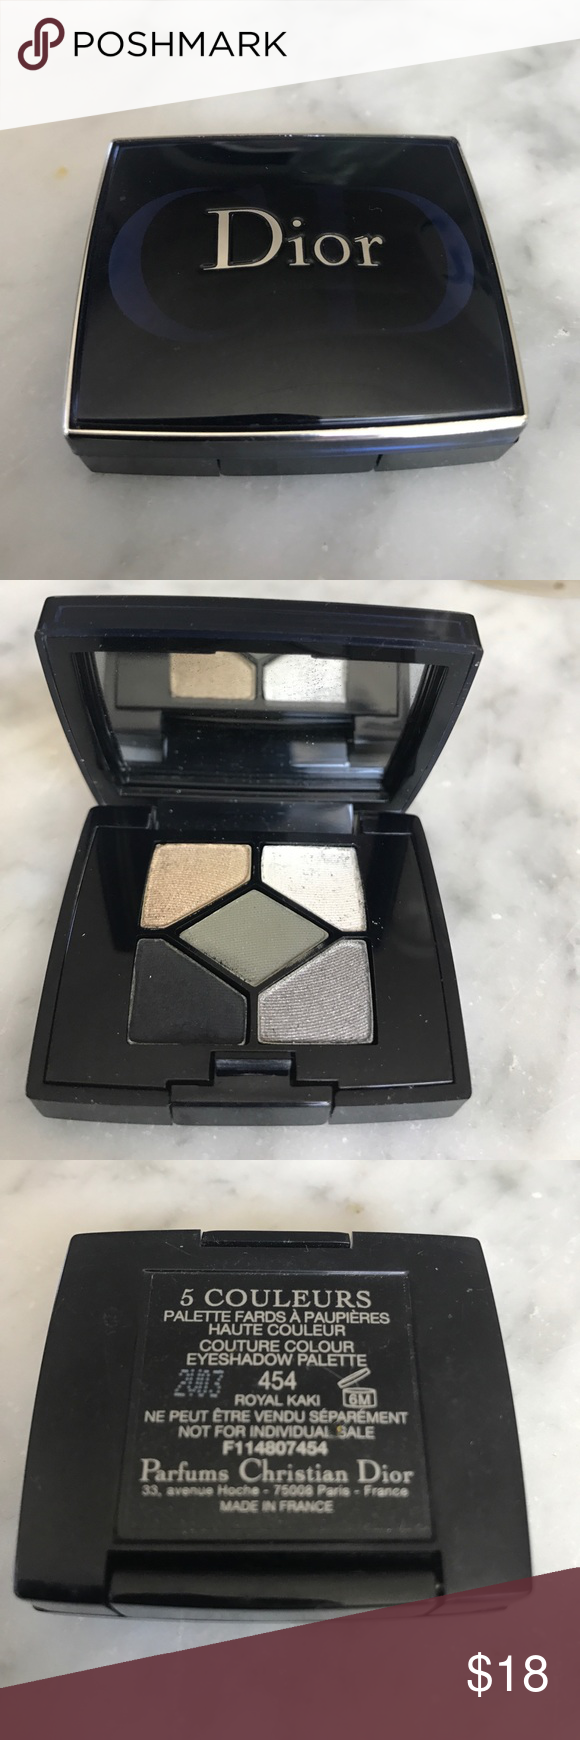 82c6f038 Christian Dior five color eyeshadow palette #454 Beautiful shadow ...